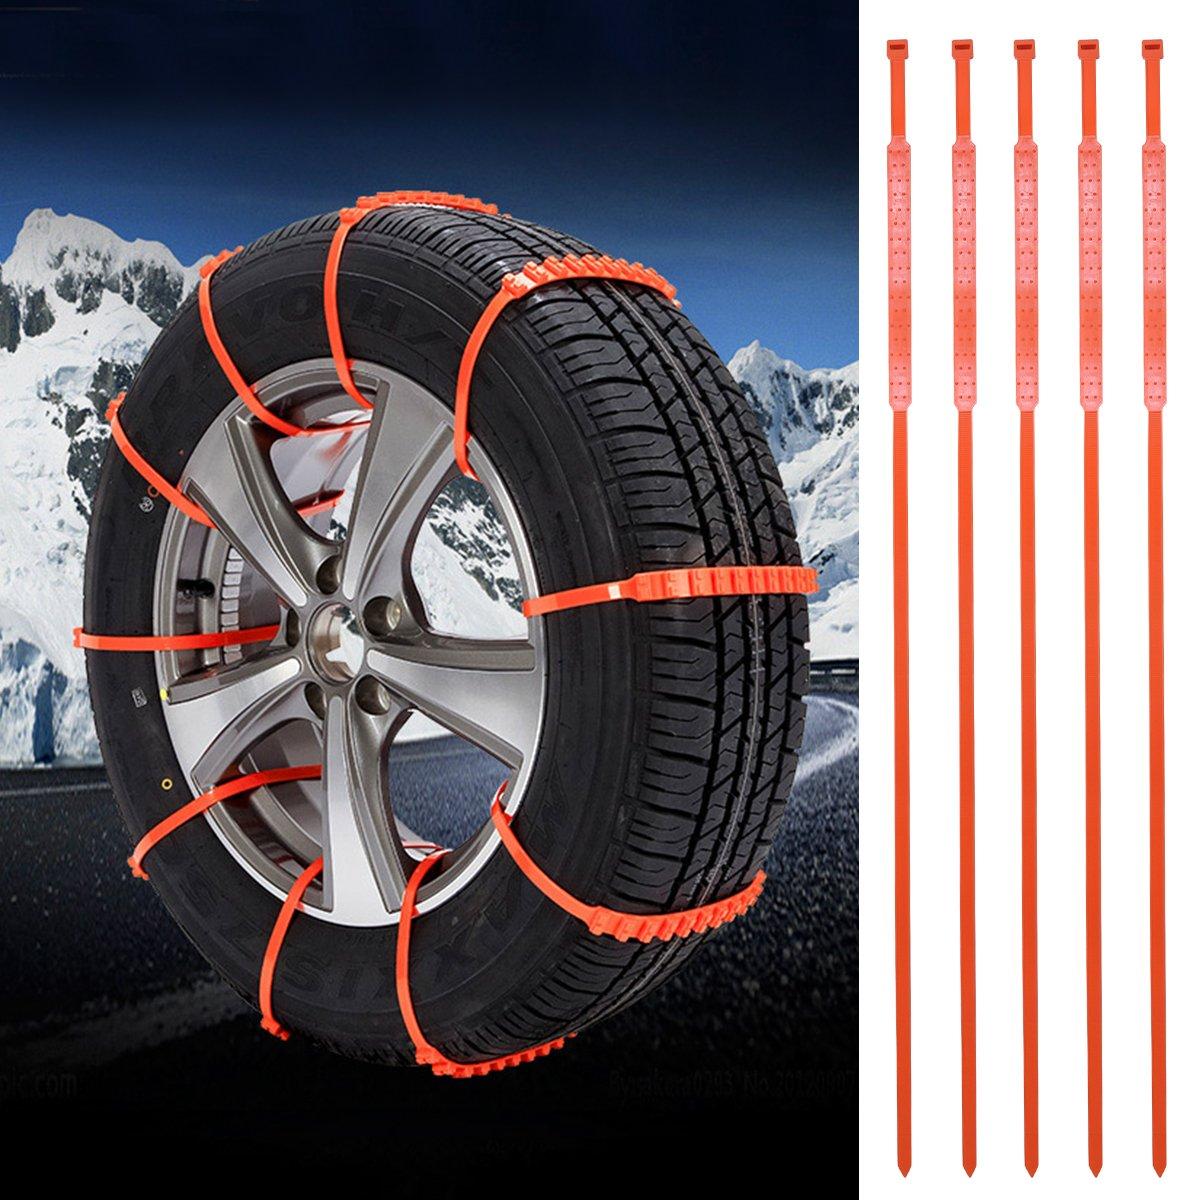 Emergency Tire Chains Set WINOMO 5Pcs Tyre Chains Car Anti-skid Chain for Sedan SUV Light Pickup Truck